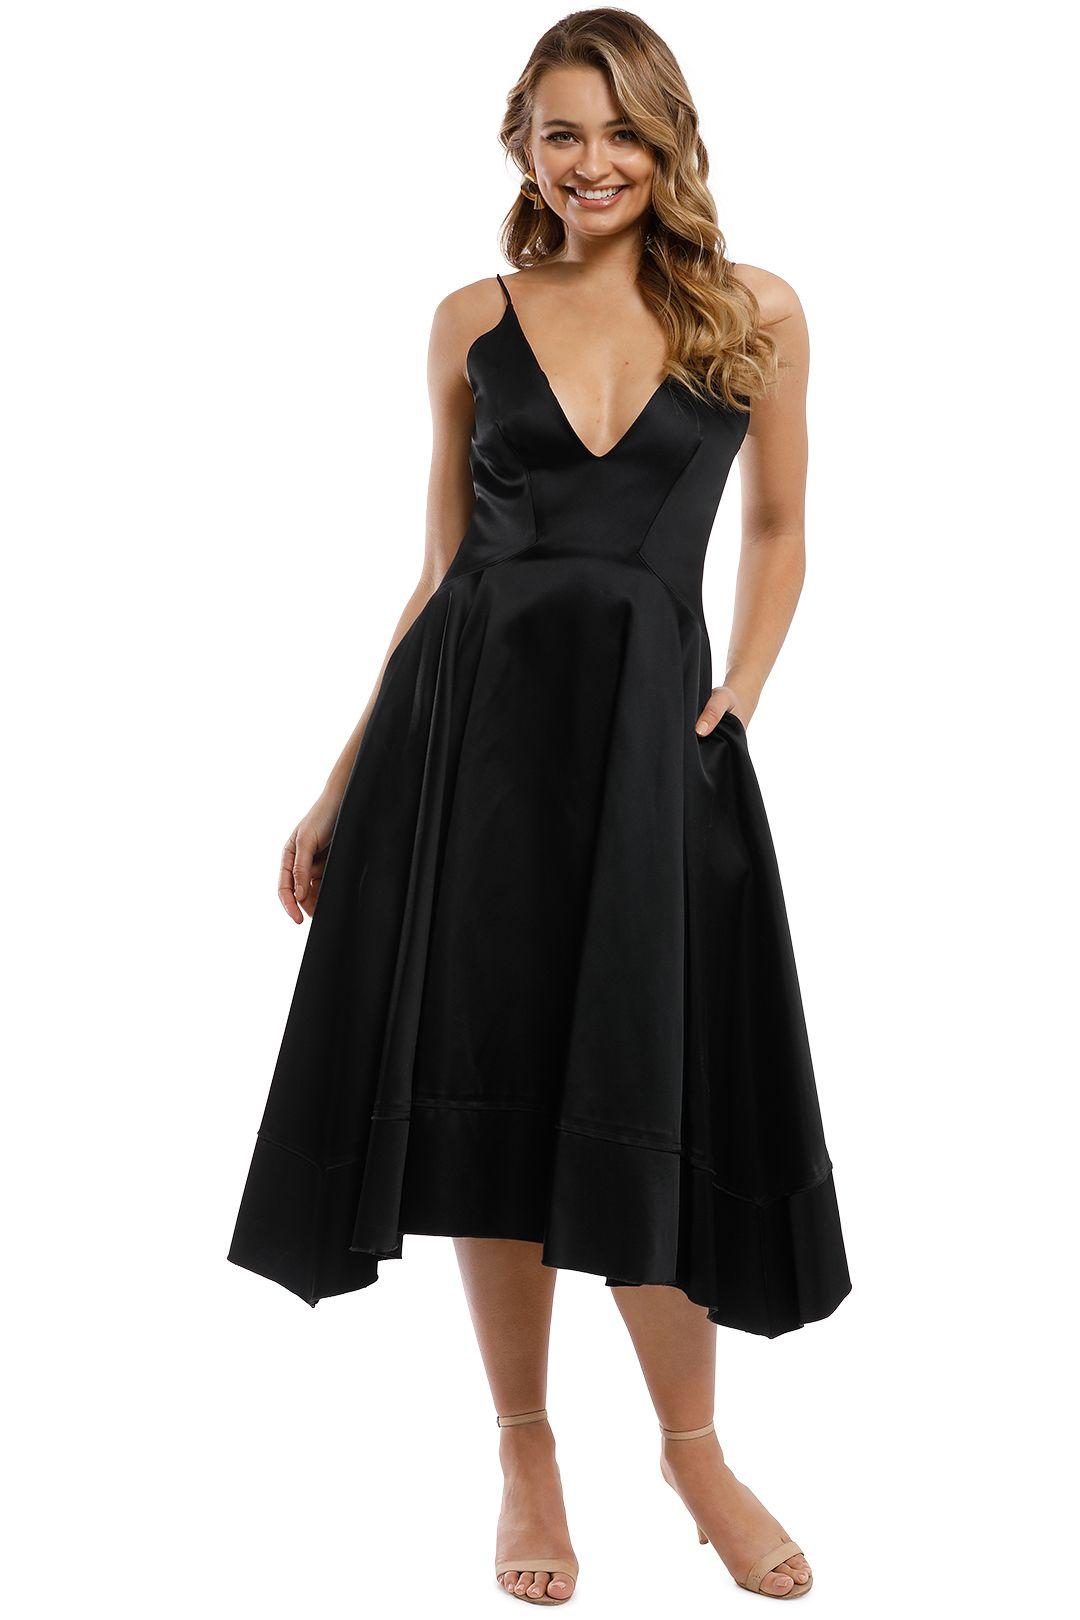 Nicholas - Duchess Satin Ball Dress - Black - Front